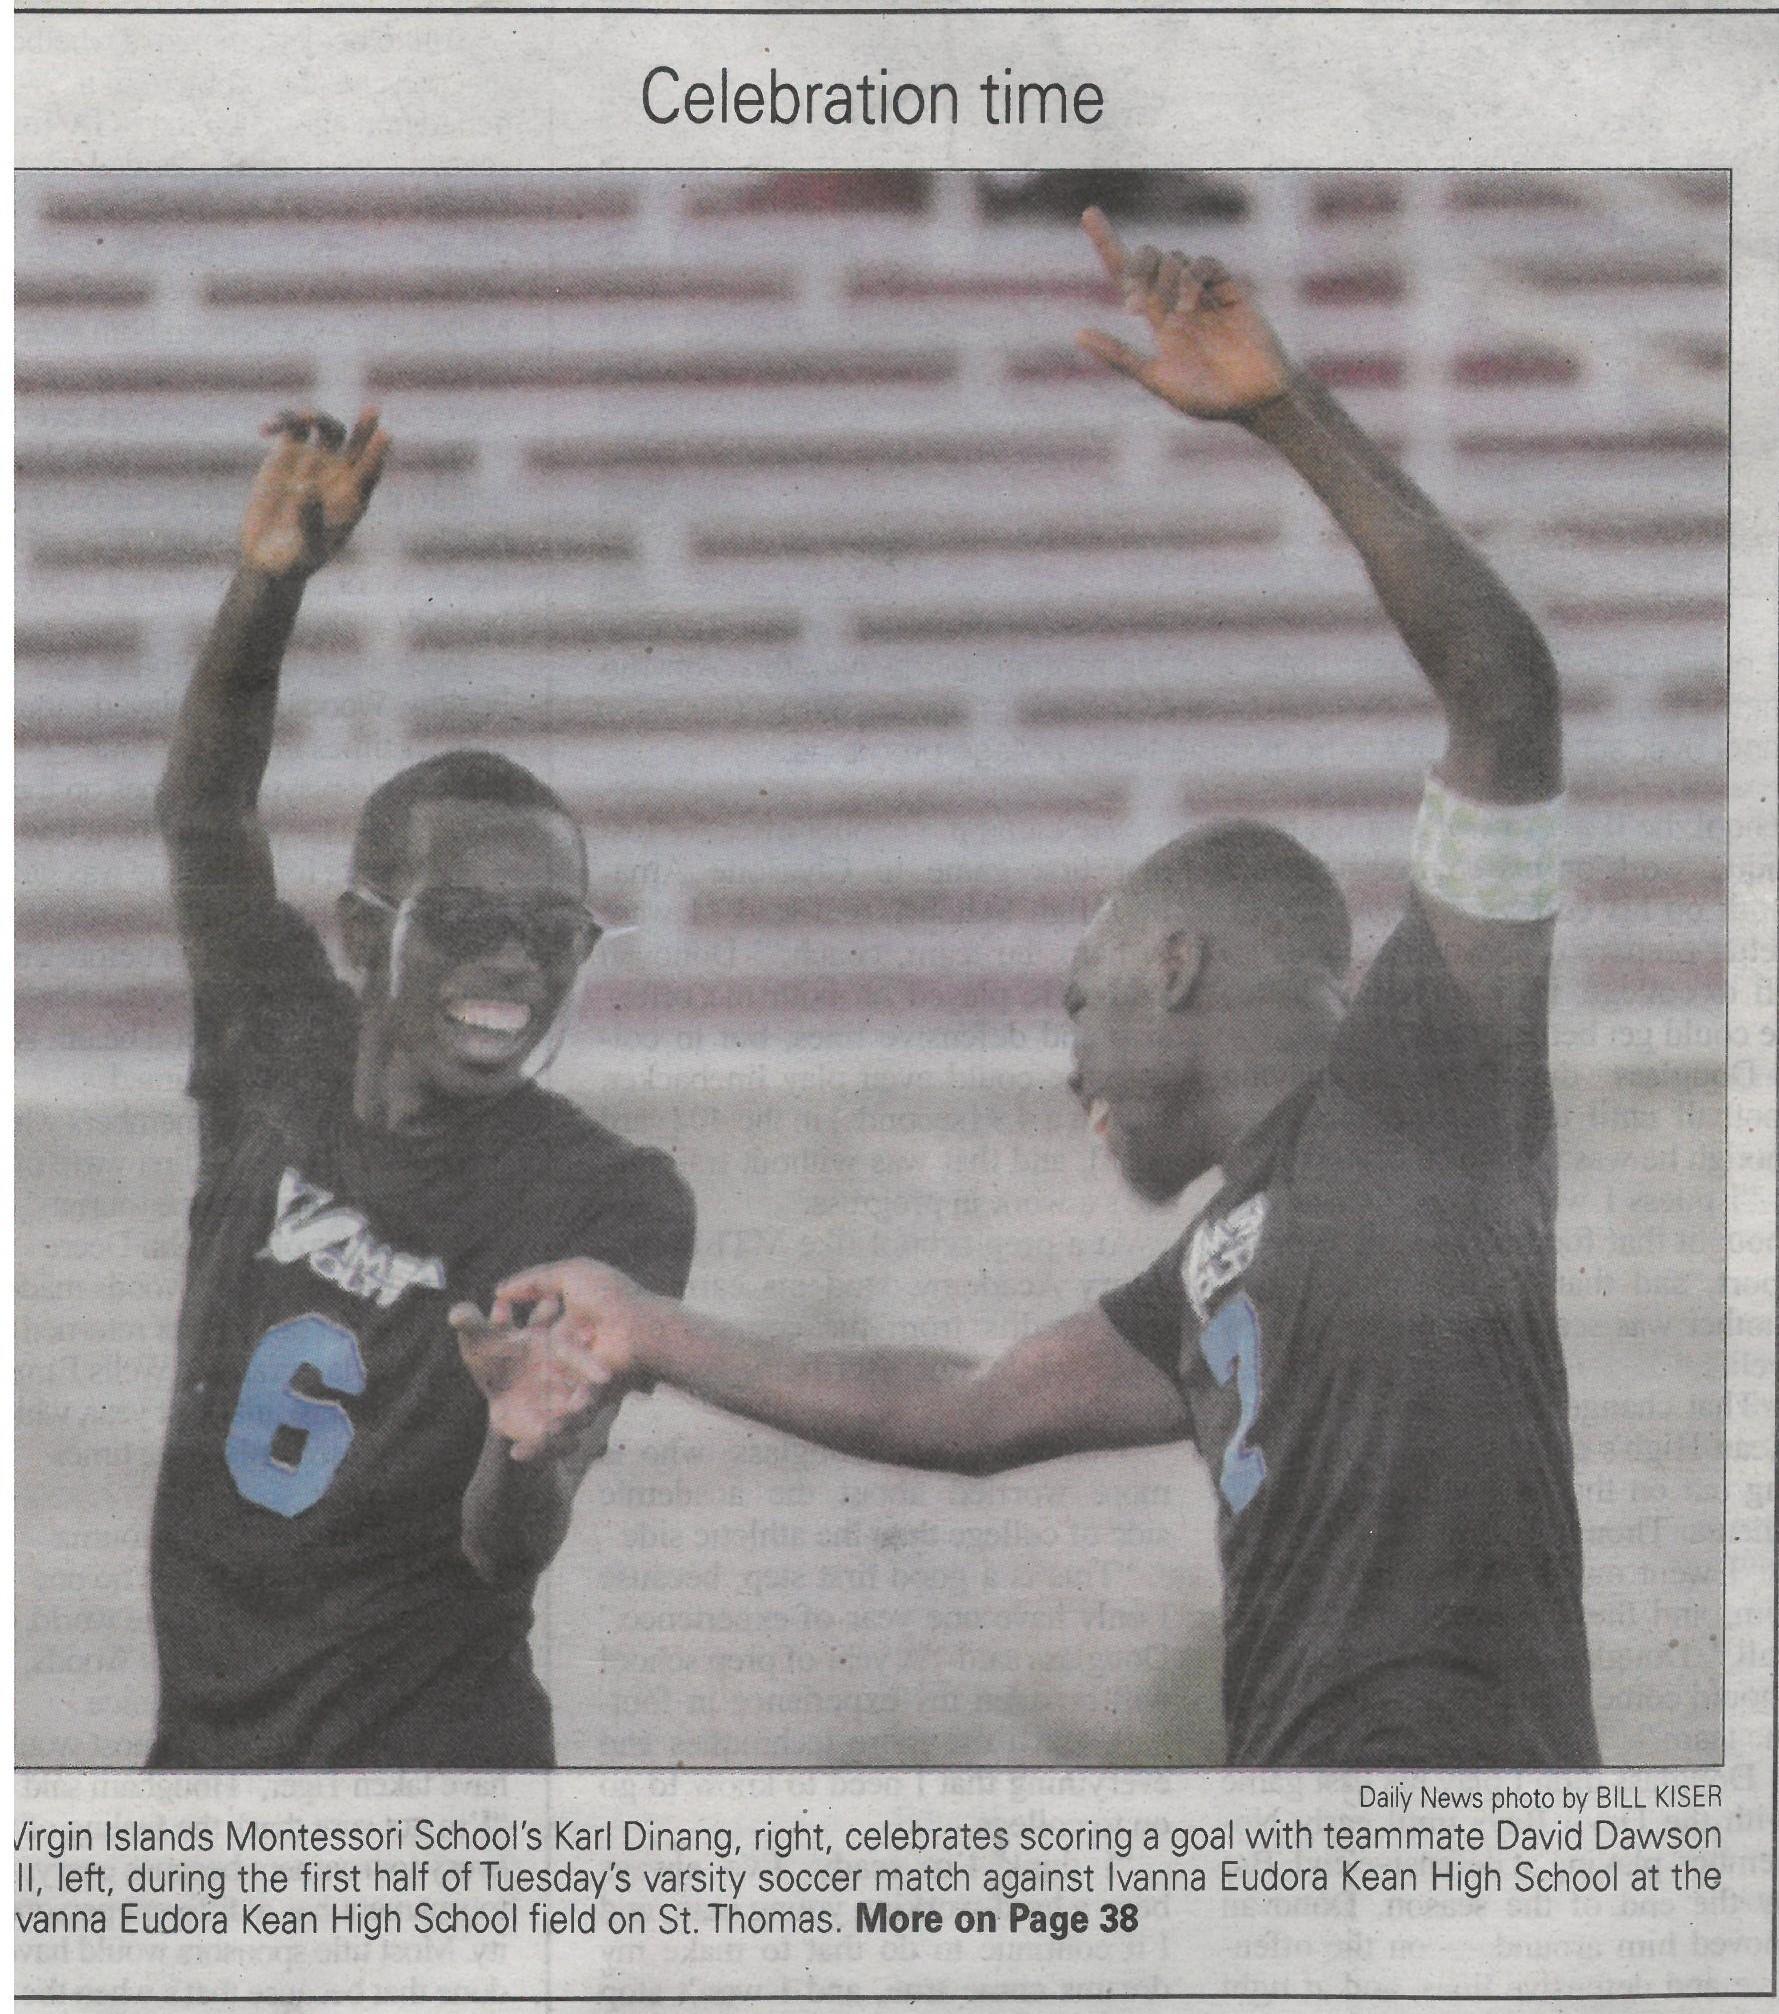 Daily News Photo Credit Bill Kiser